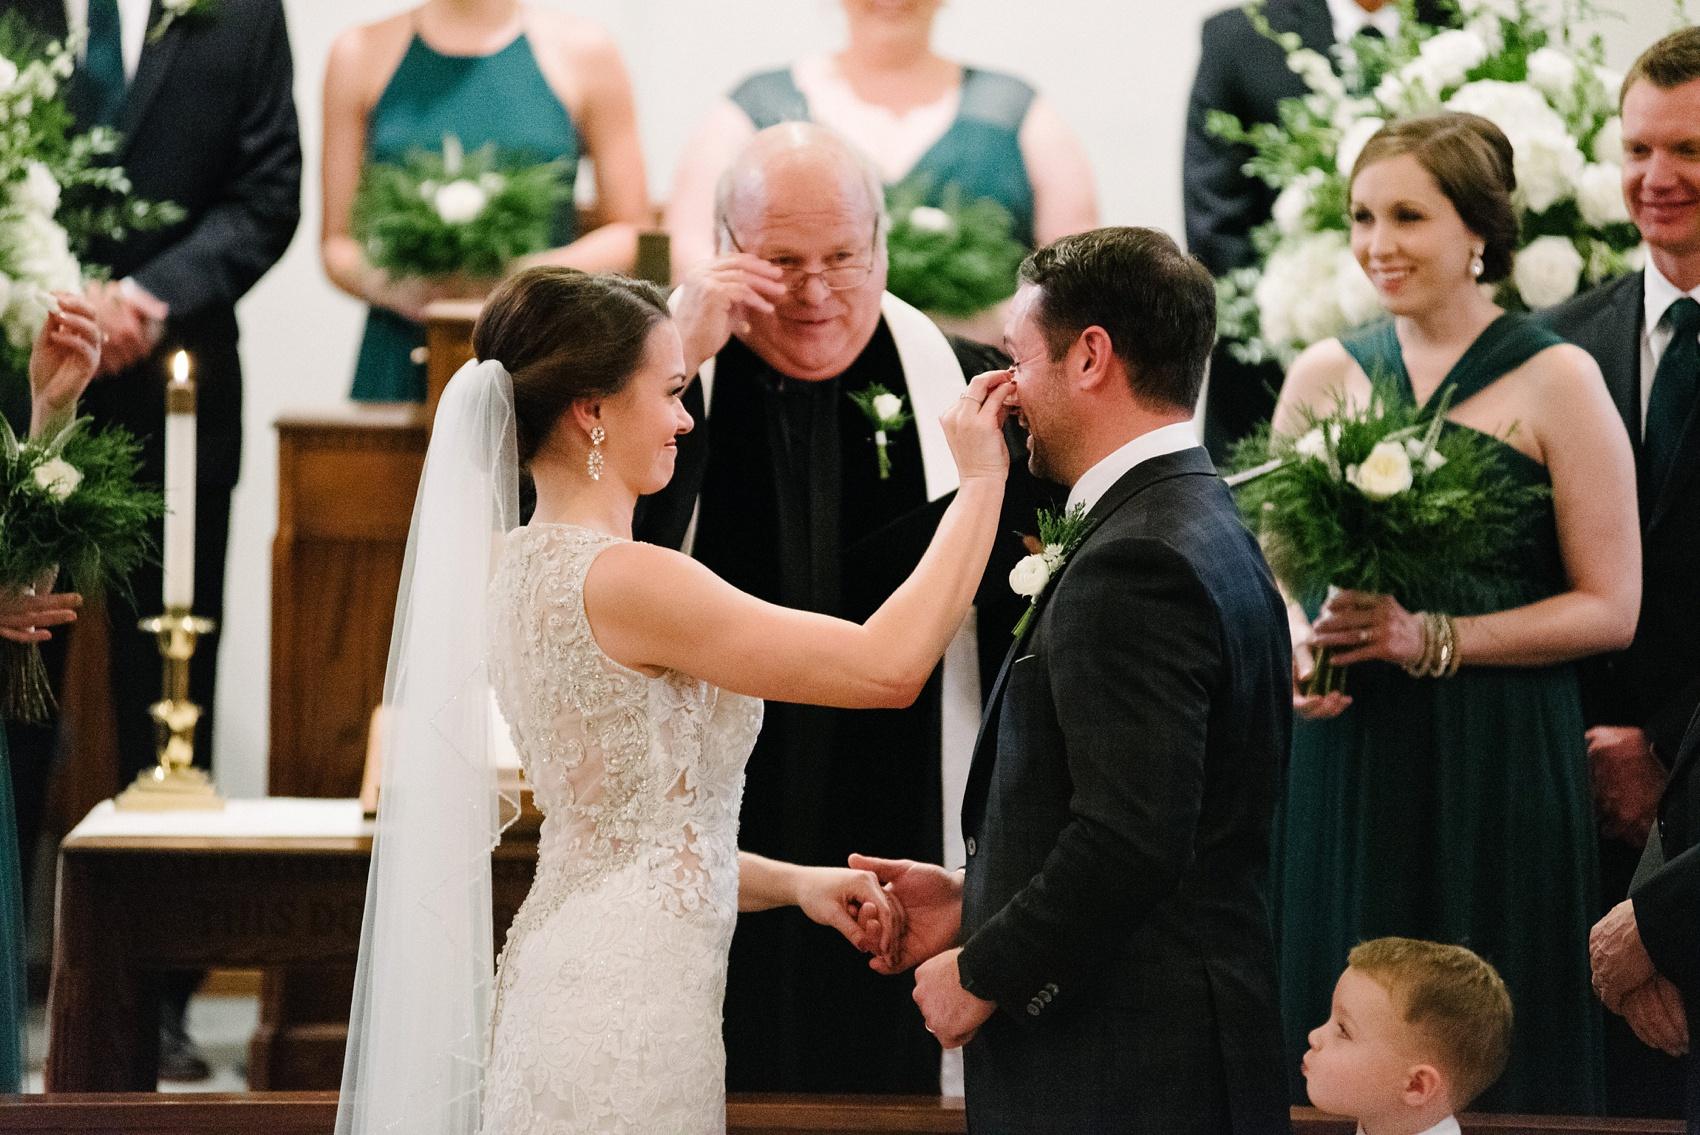 sc_wedding_photographer_2900.jpg